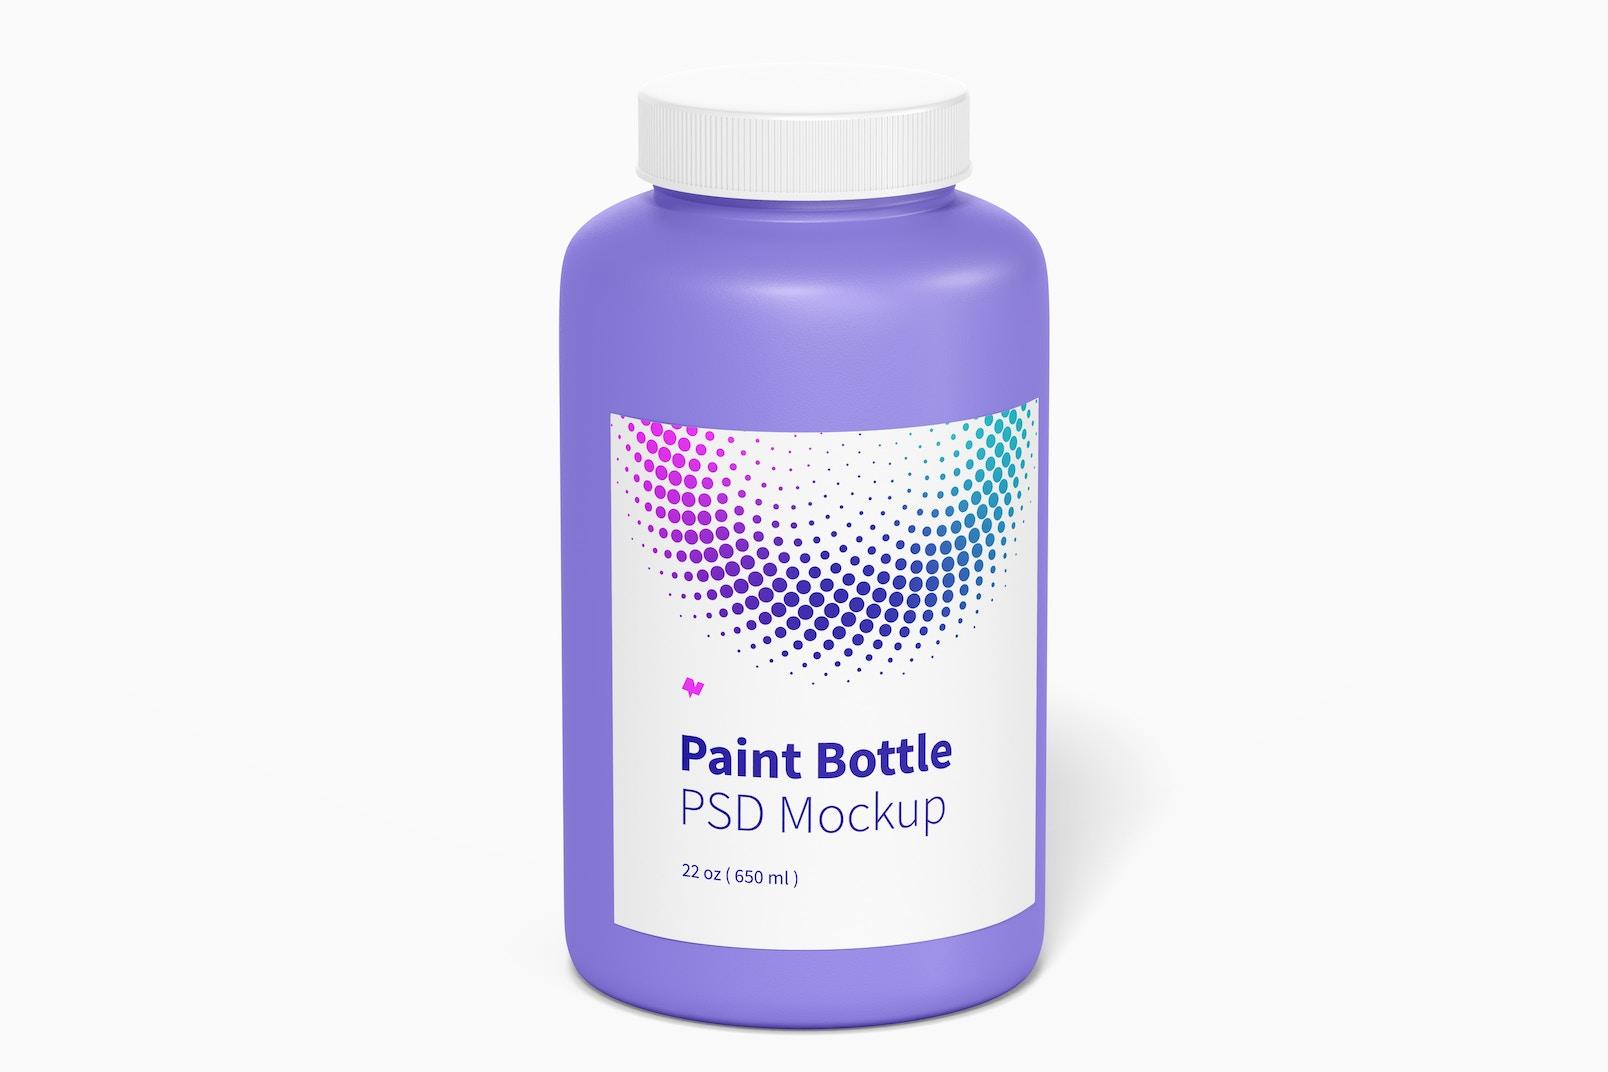 22 oz Paint Bottle Mockup